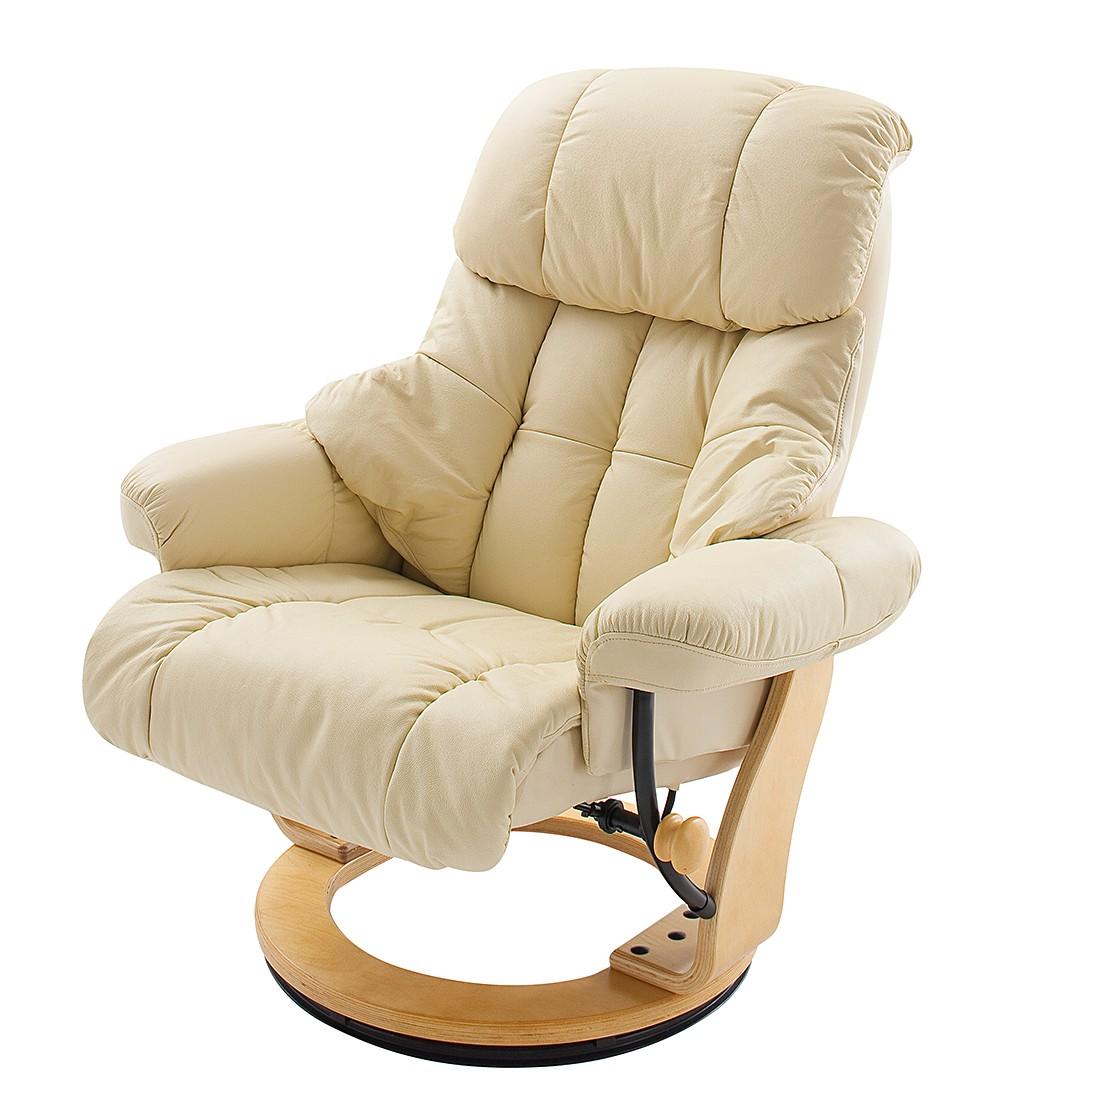 Fauteuil de relaxation Grunewald (avec repose-pieds) - Cuir véritable - Beige, Nuovoform